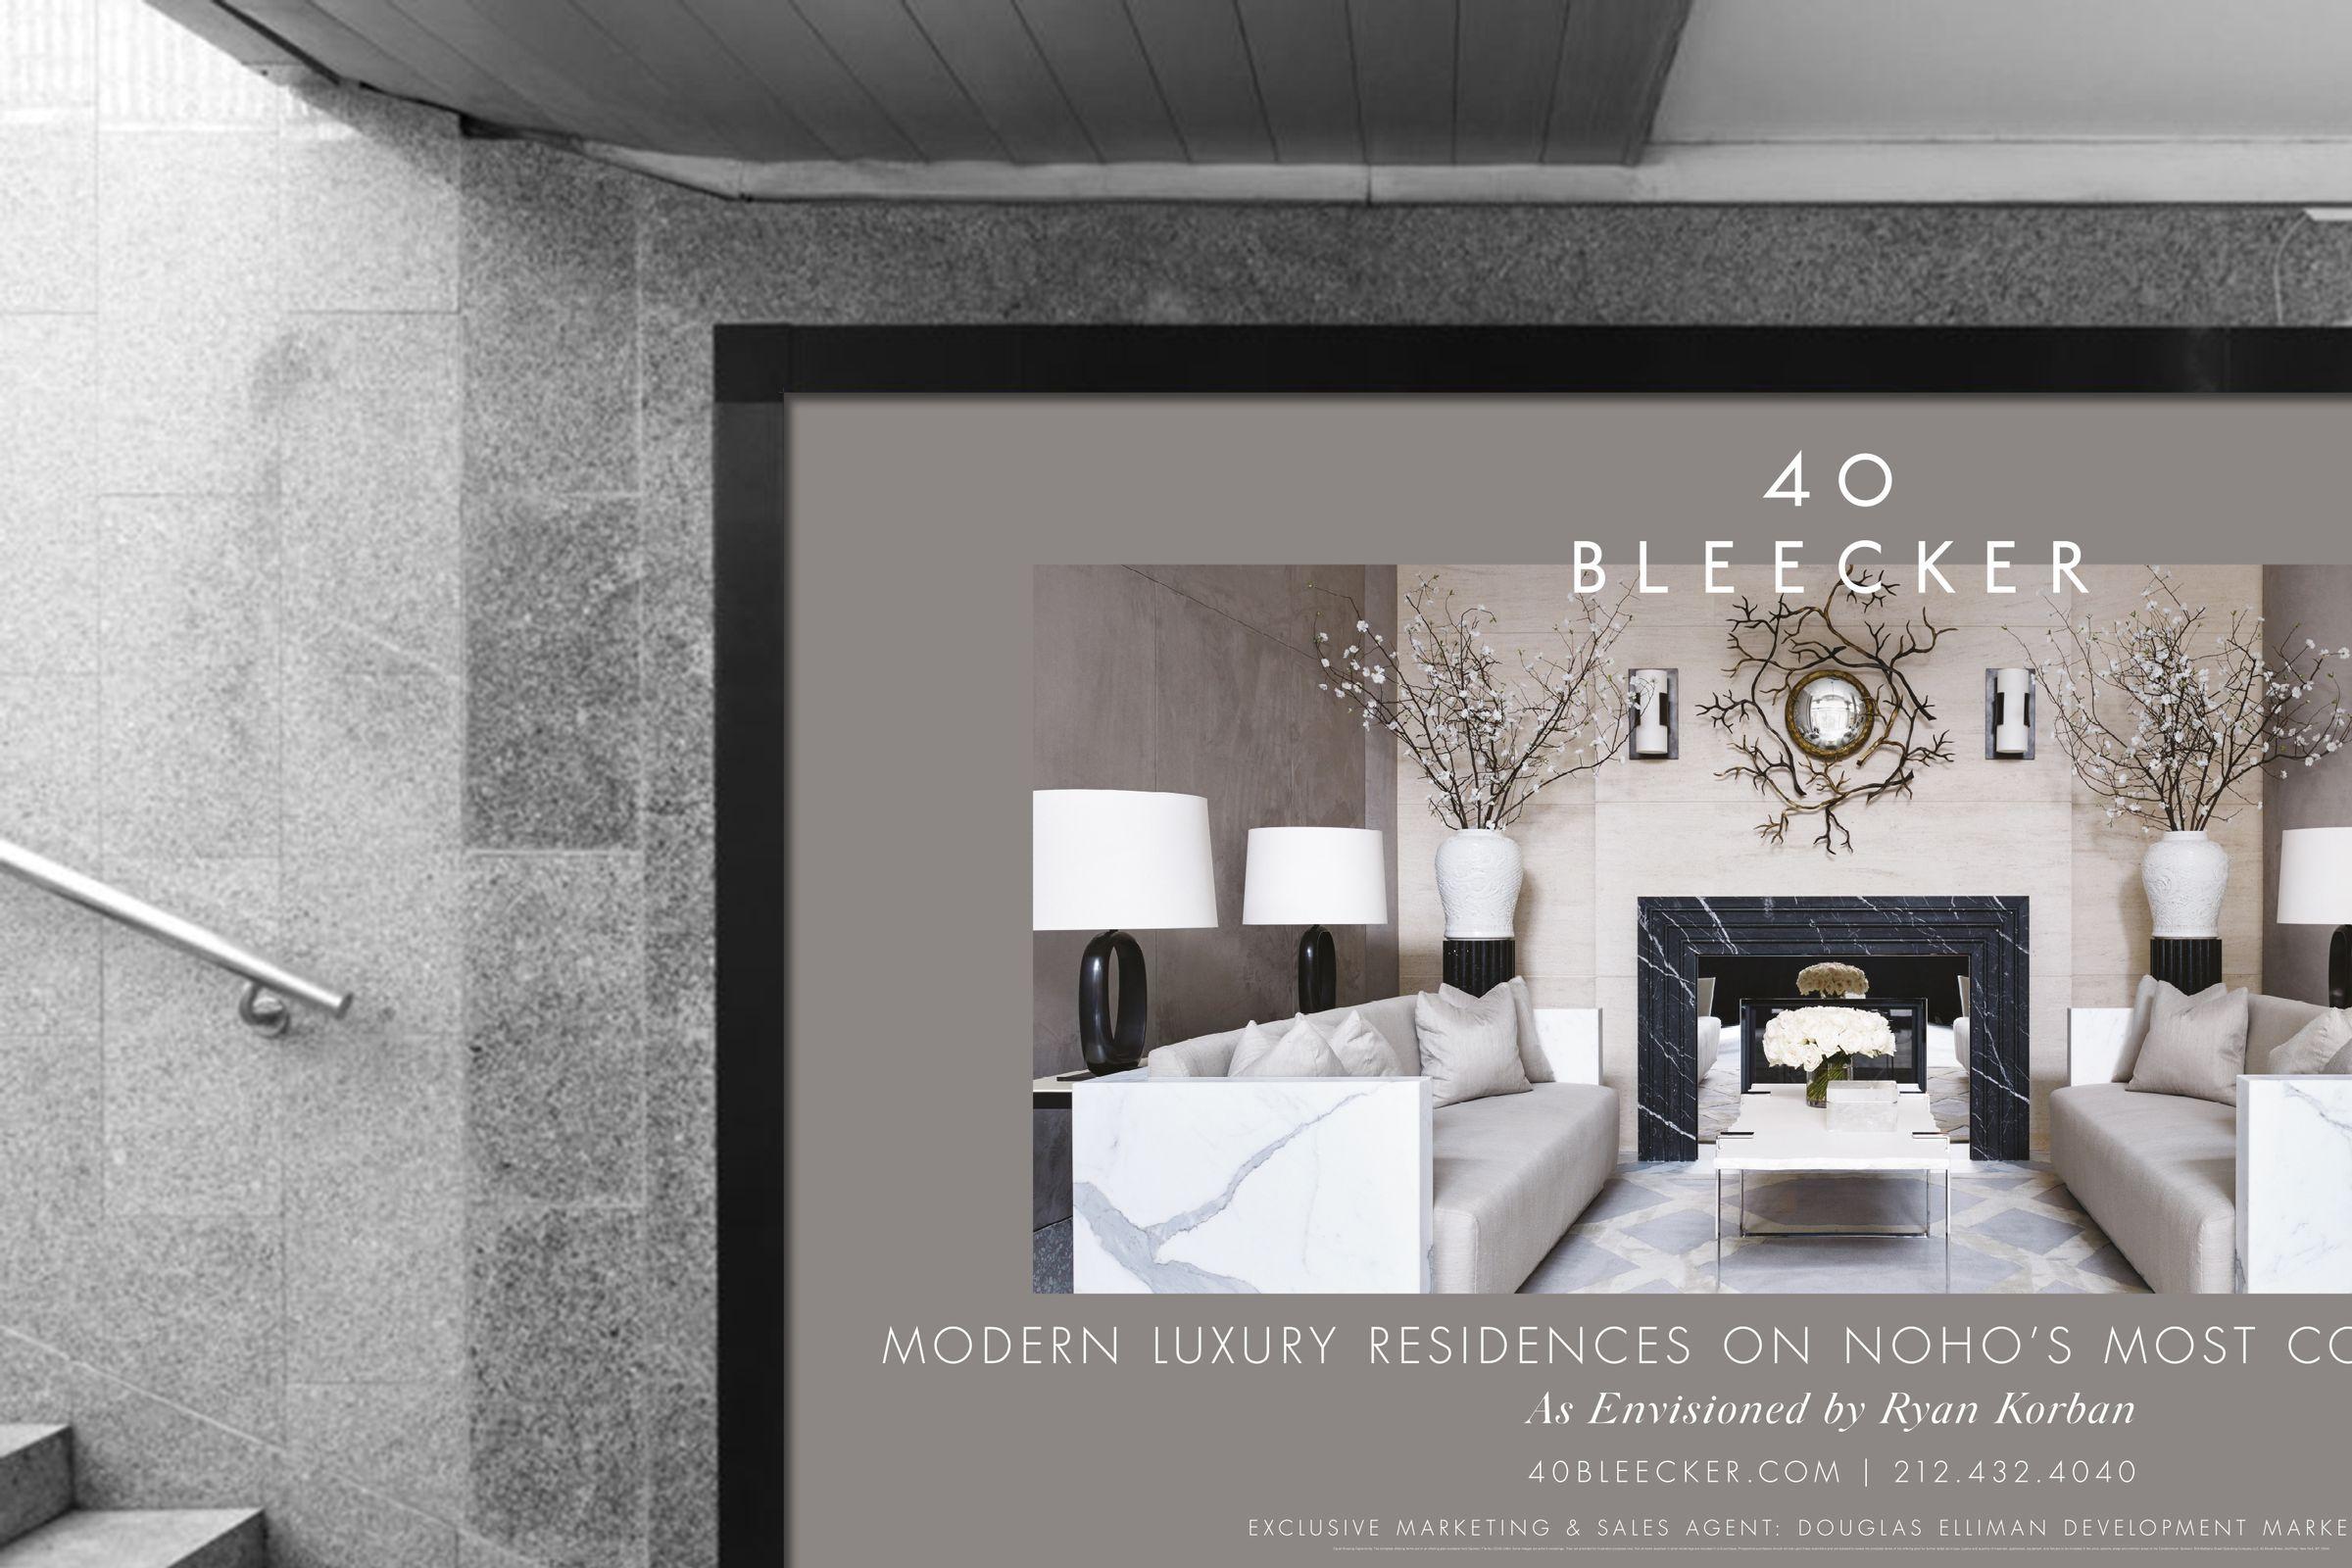 40 Bleecker billboard design